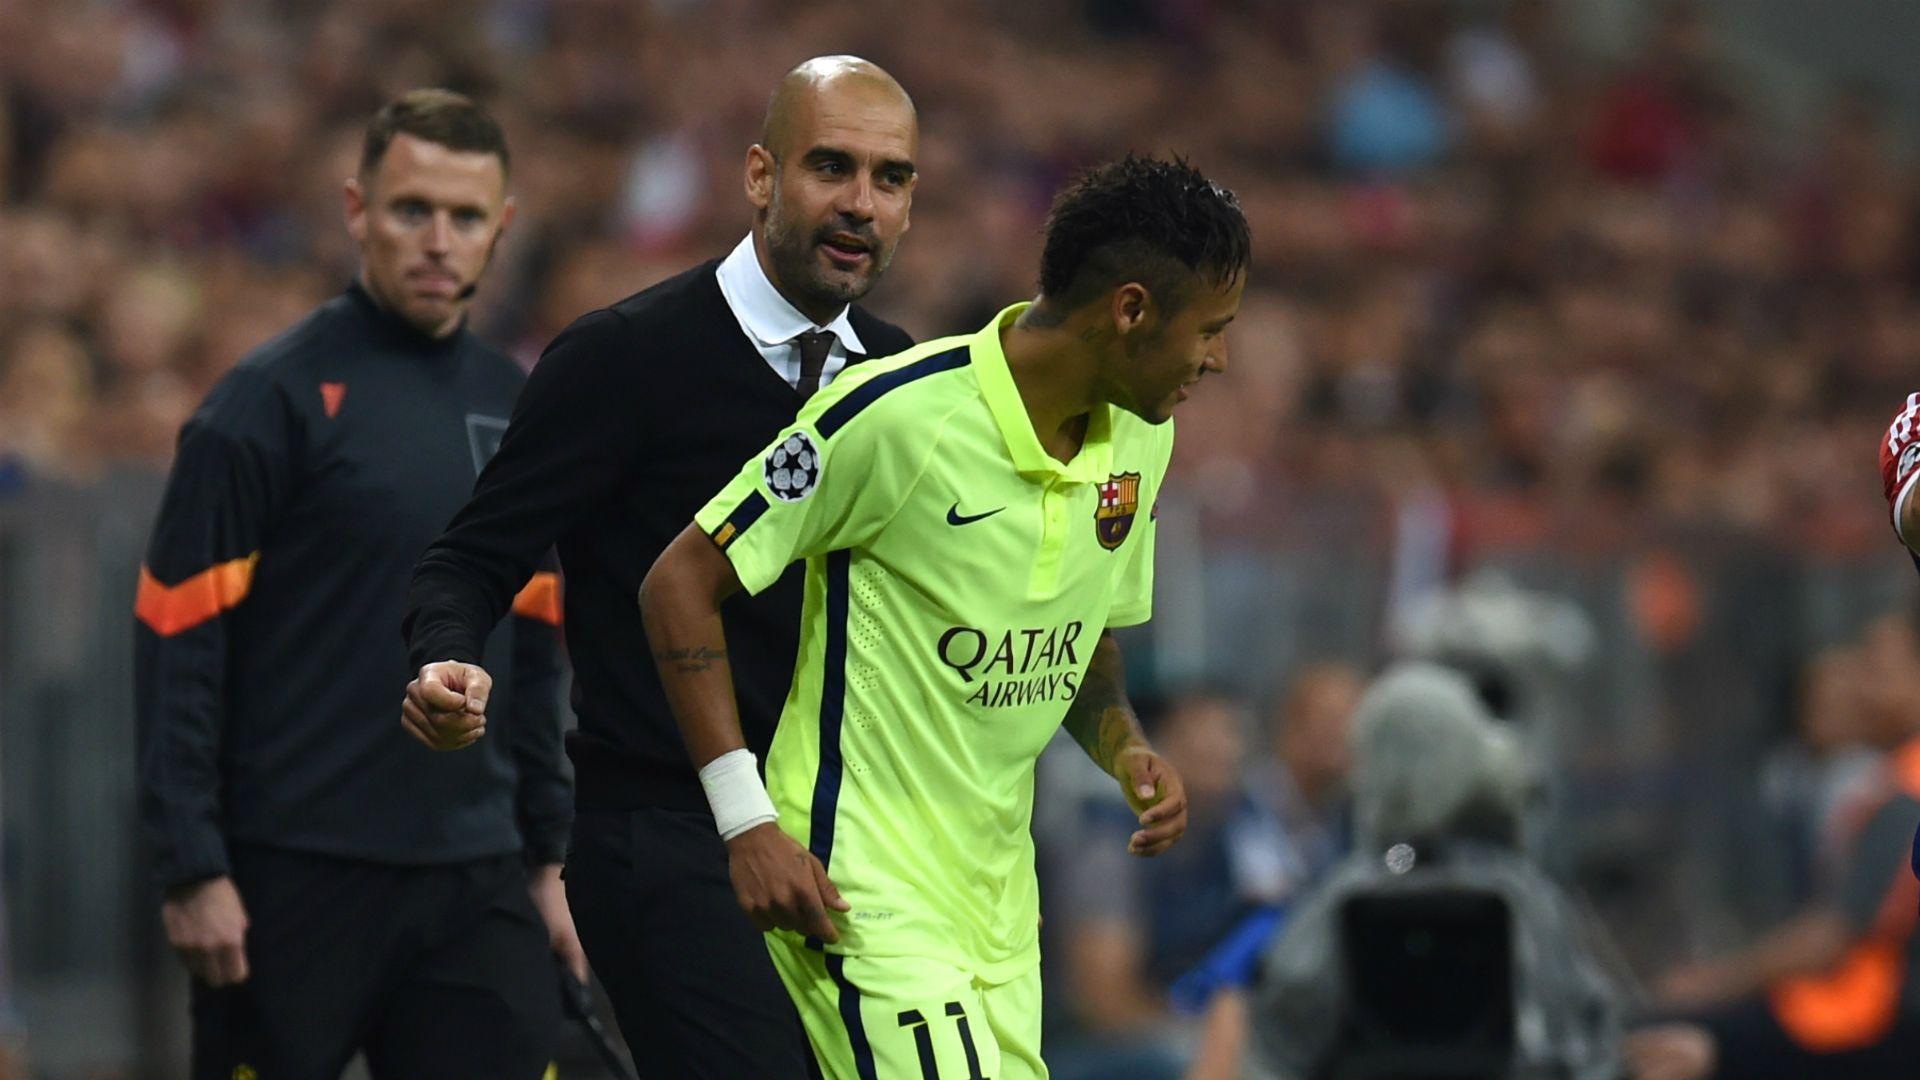 Neymar would already be world's best under Guardiola Dani